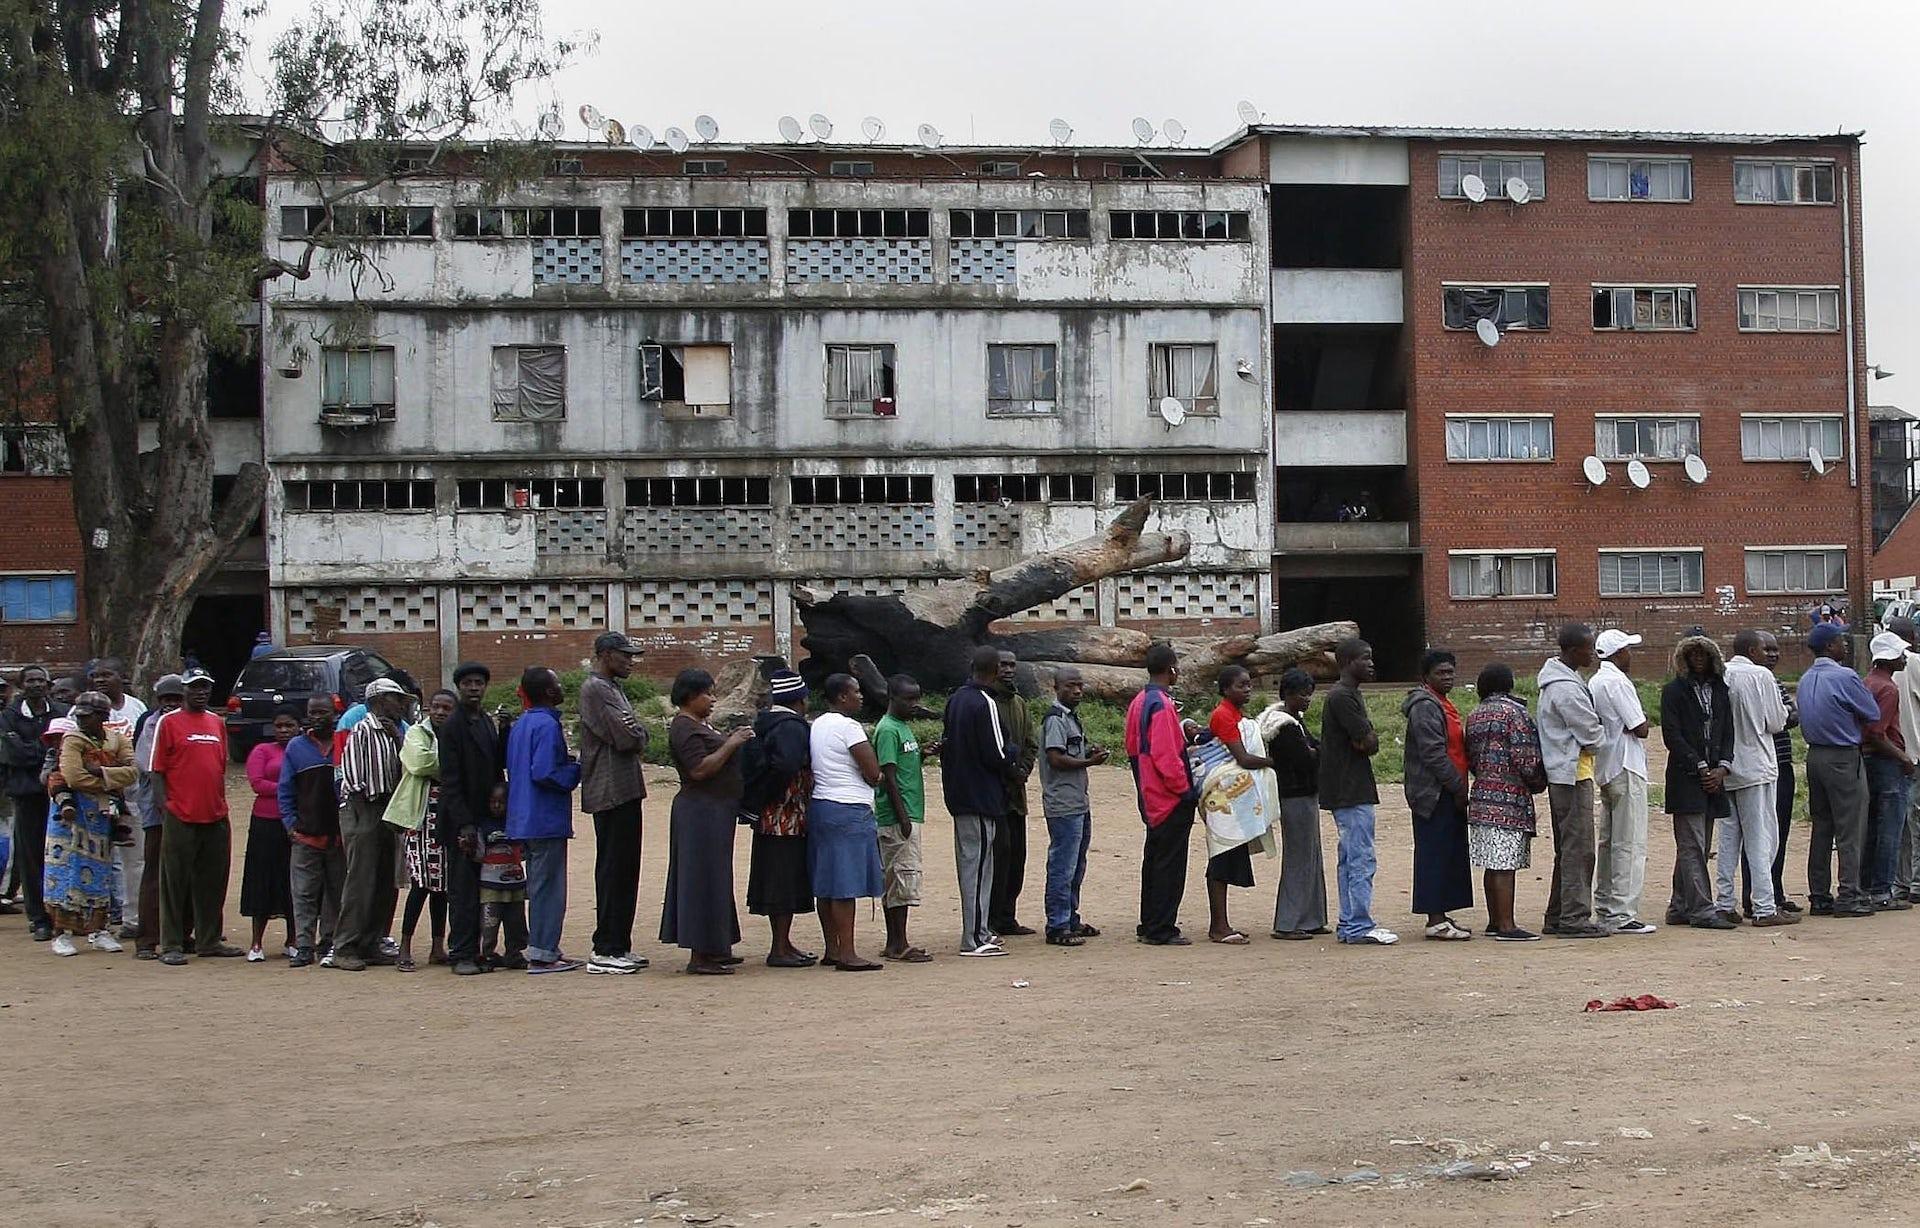 Women keep democracy's heart beating in Mugabe's Zimbabwe